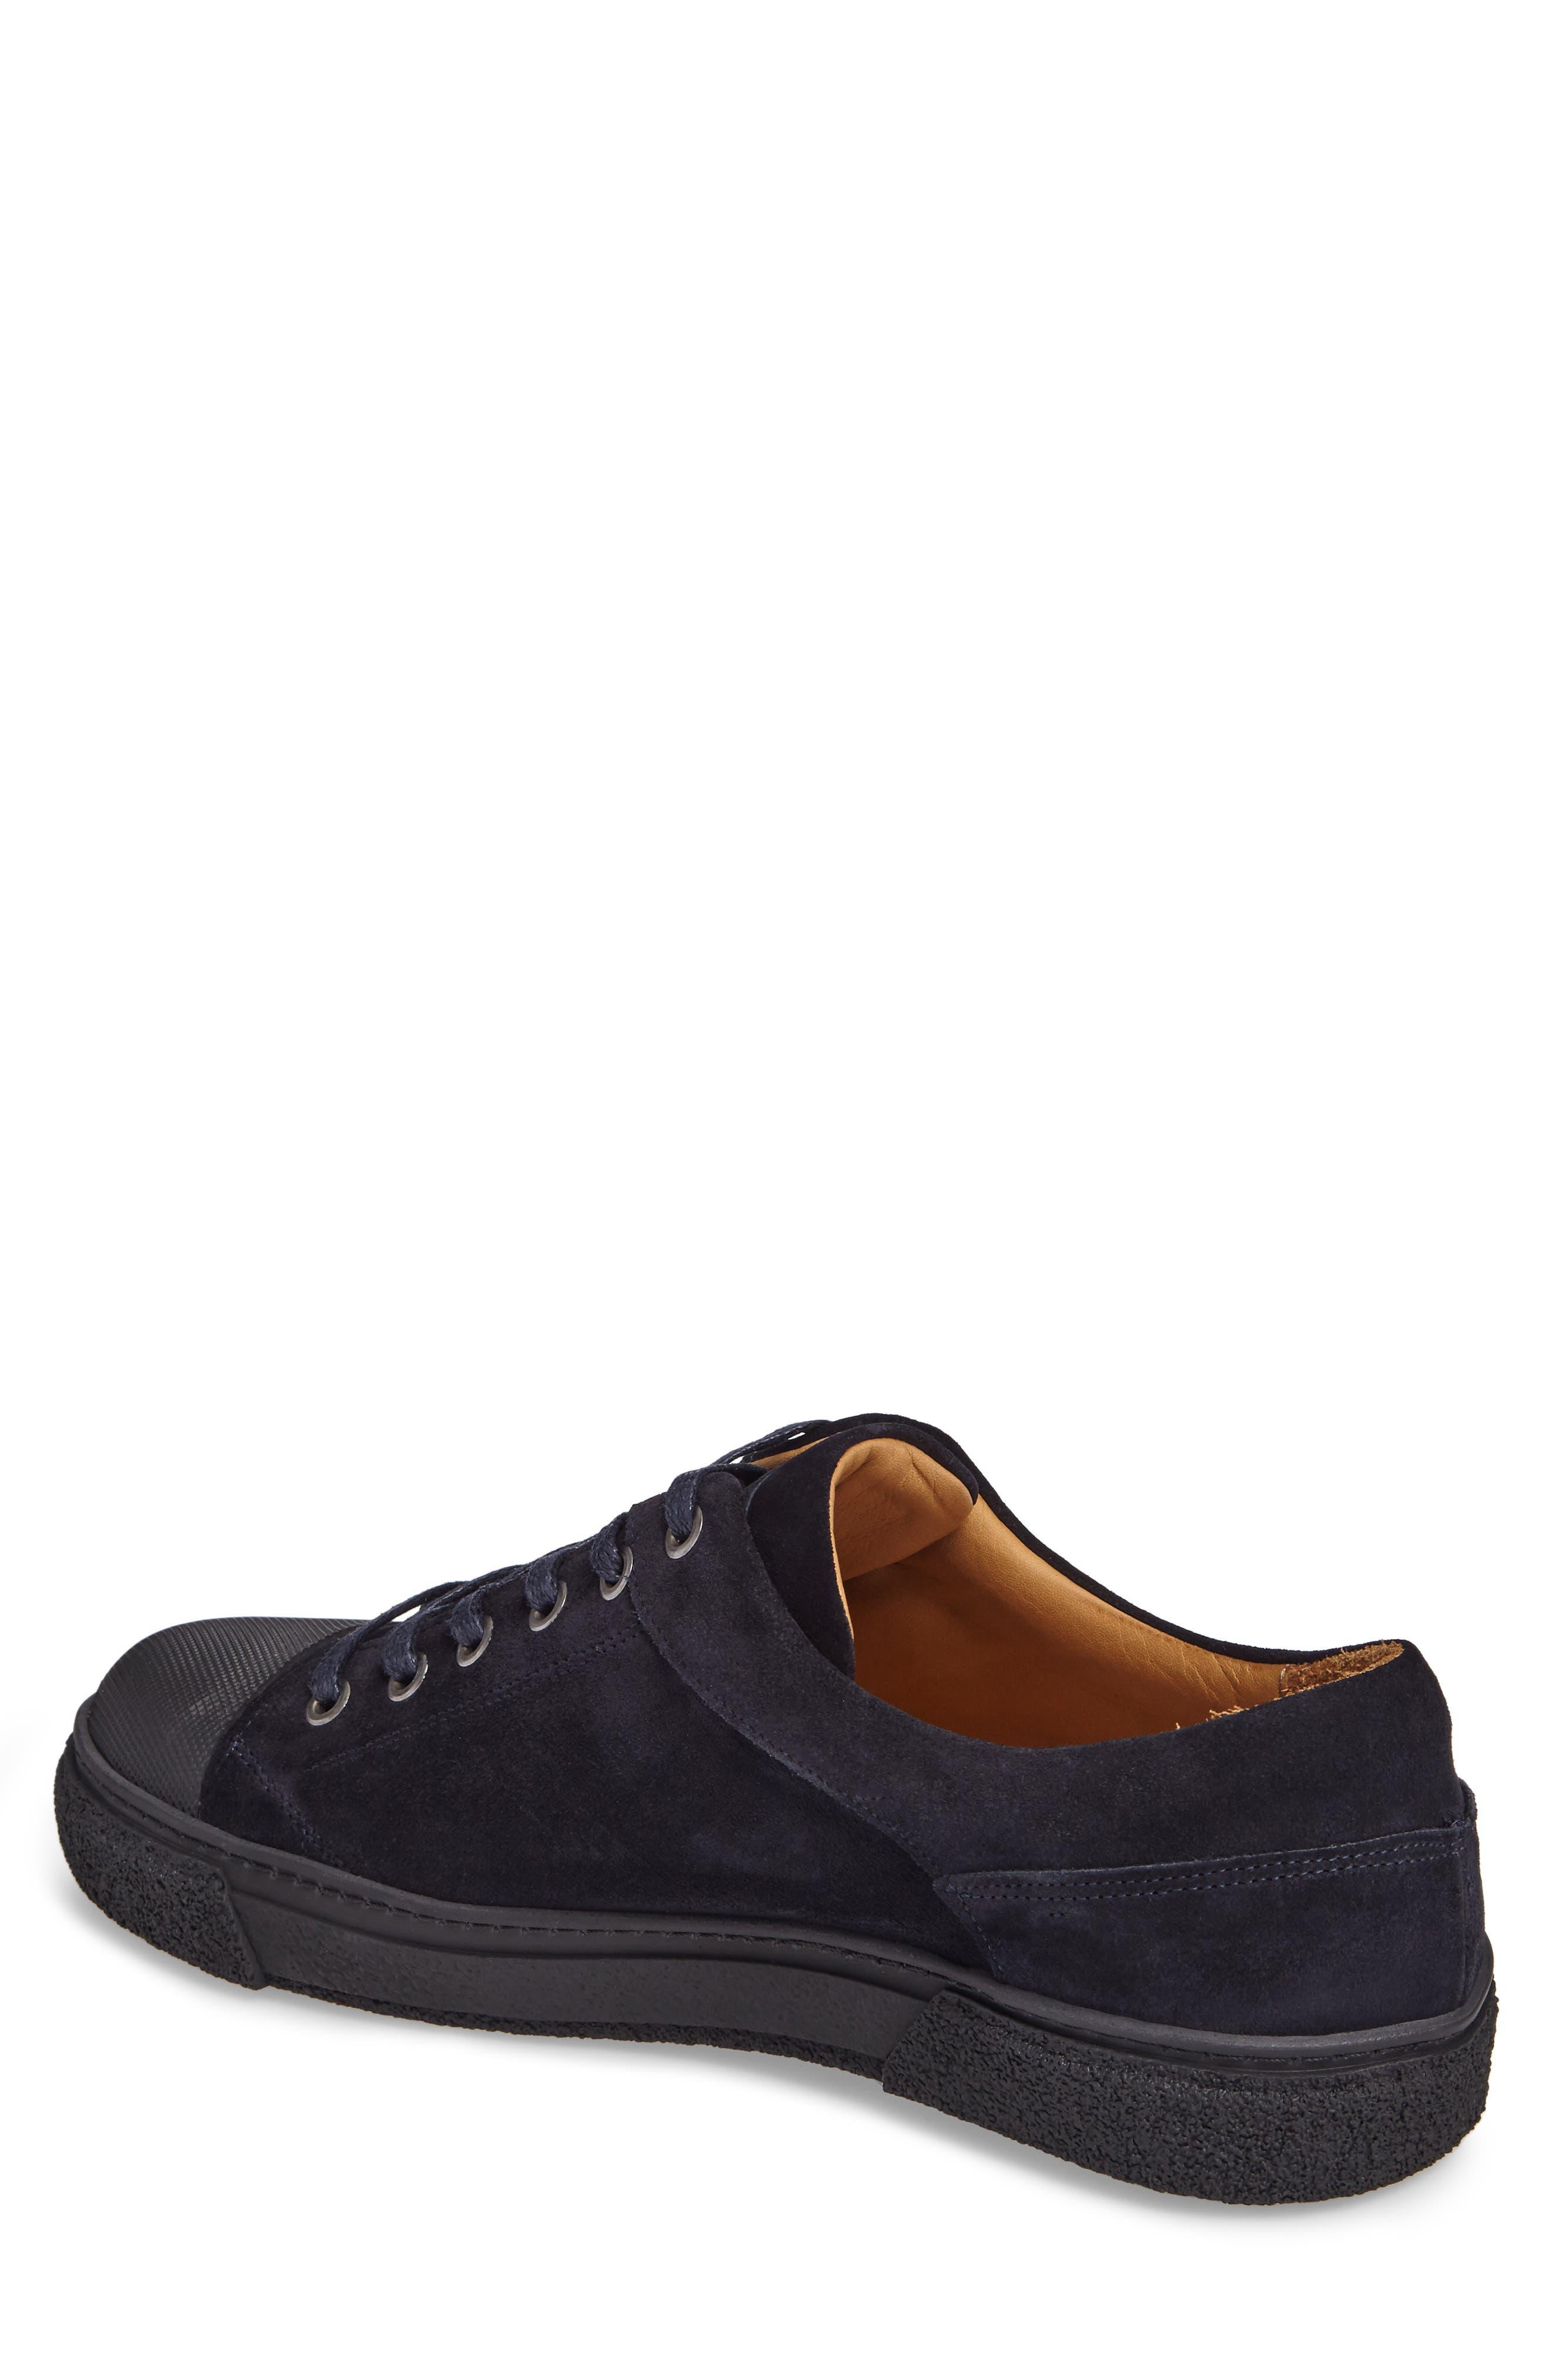 Alternate Image 2  - Vince Camuto Wallsem Sneaker (Men)